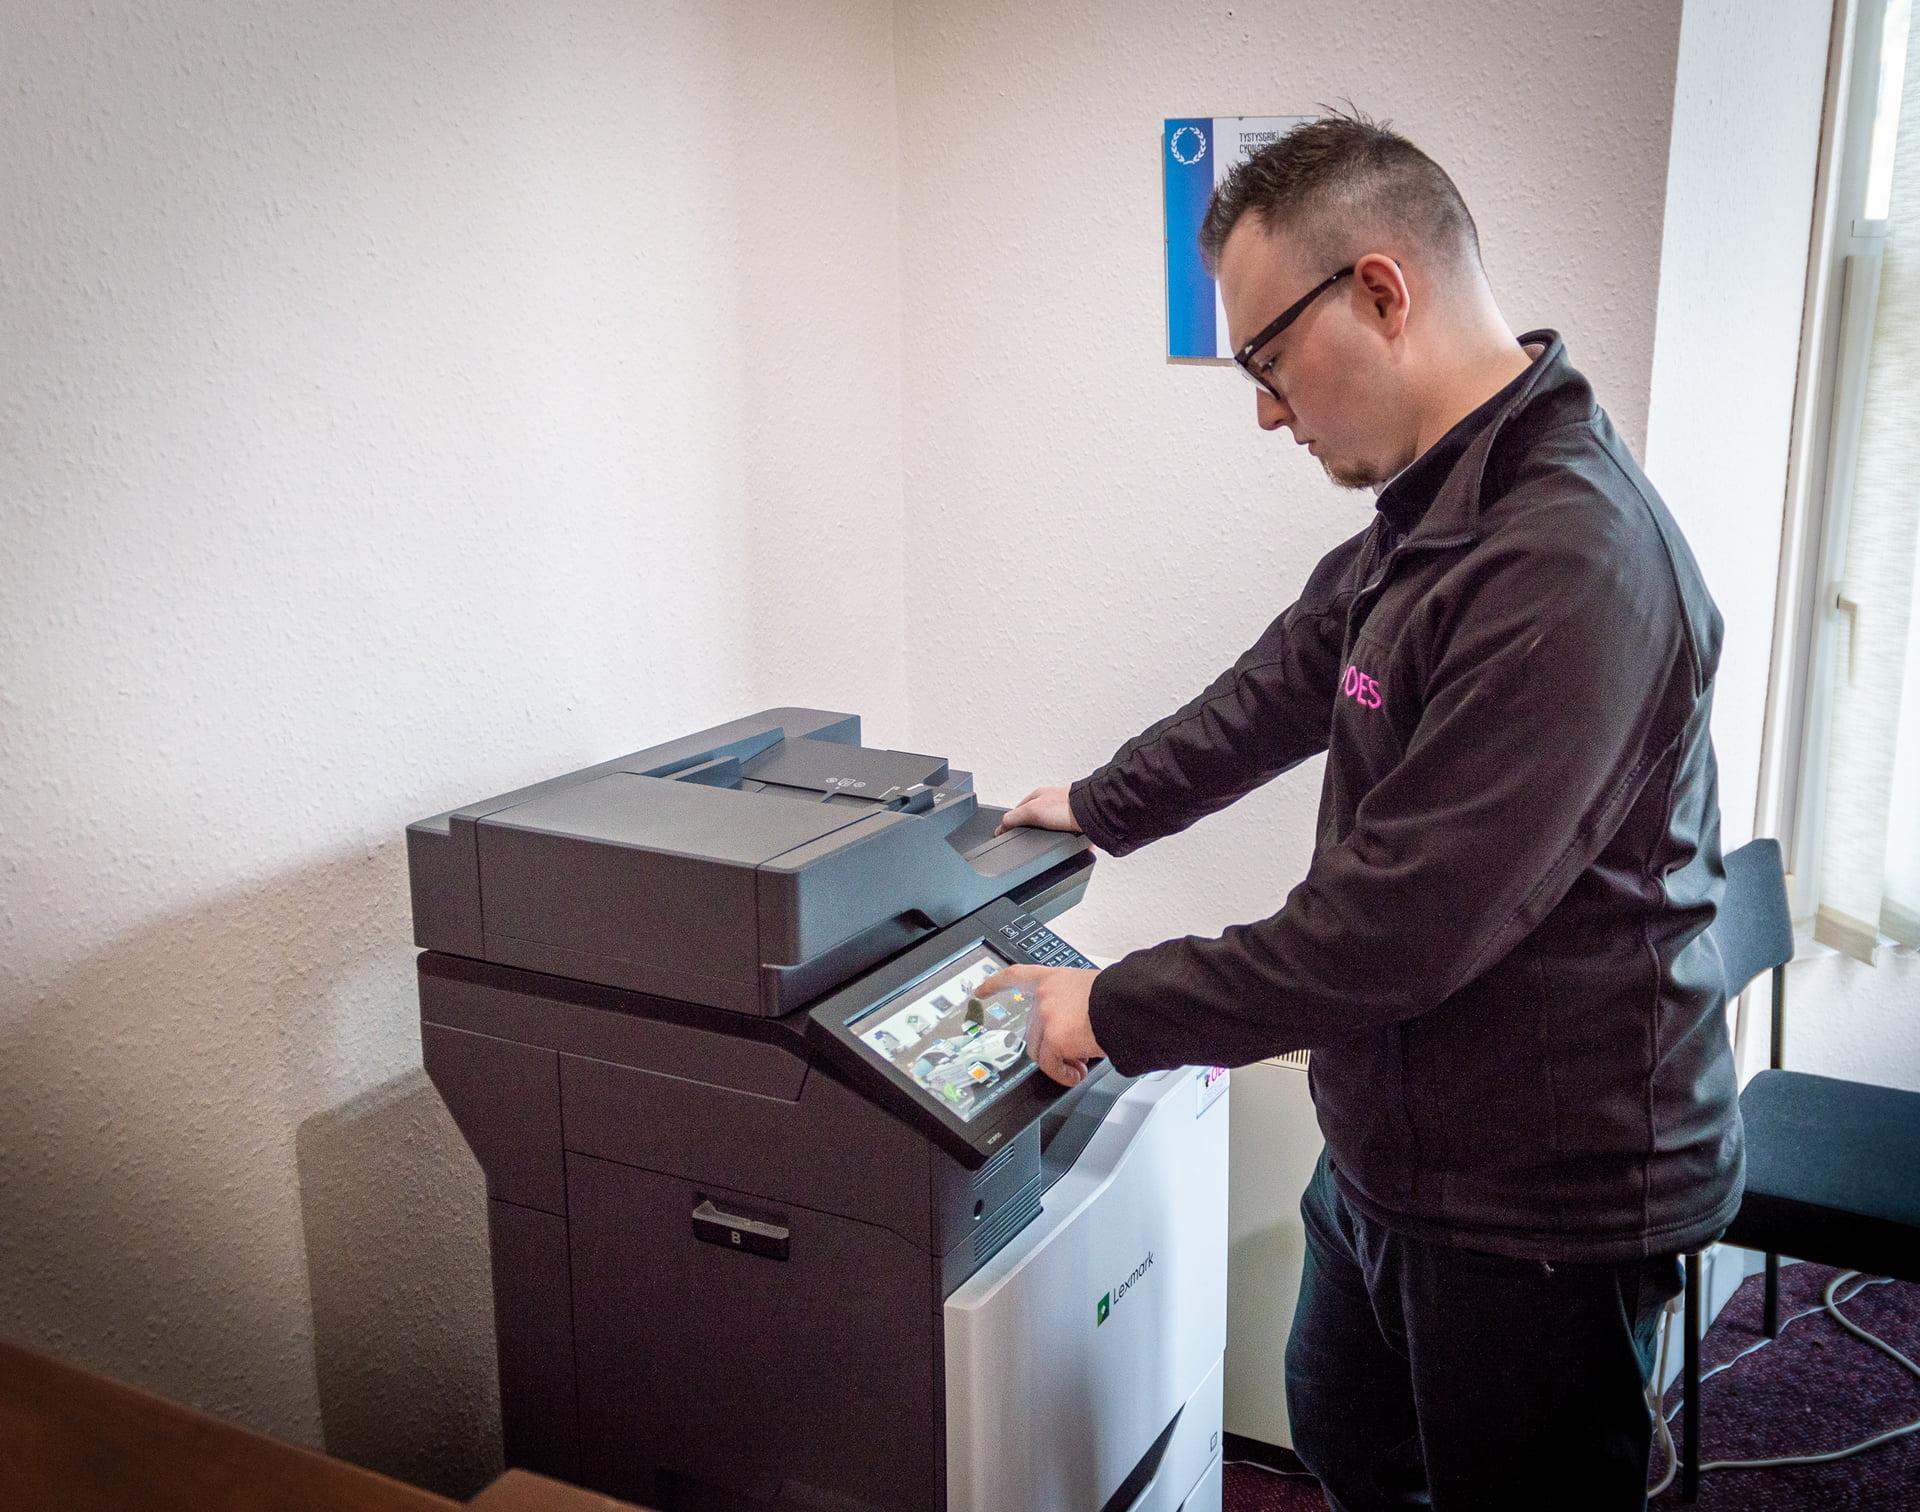 OES photocopier engineer working on an A3 Lexmark